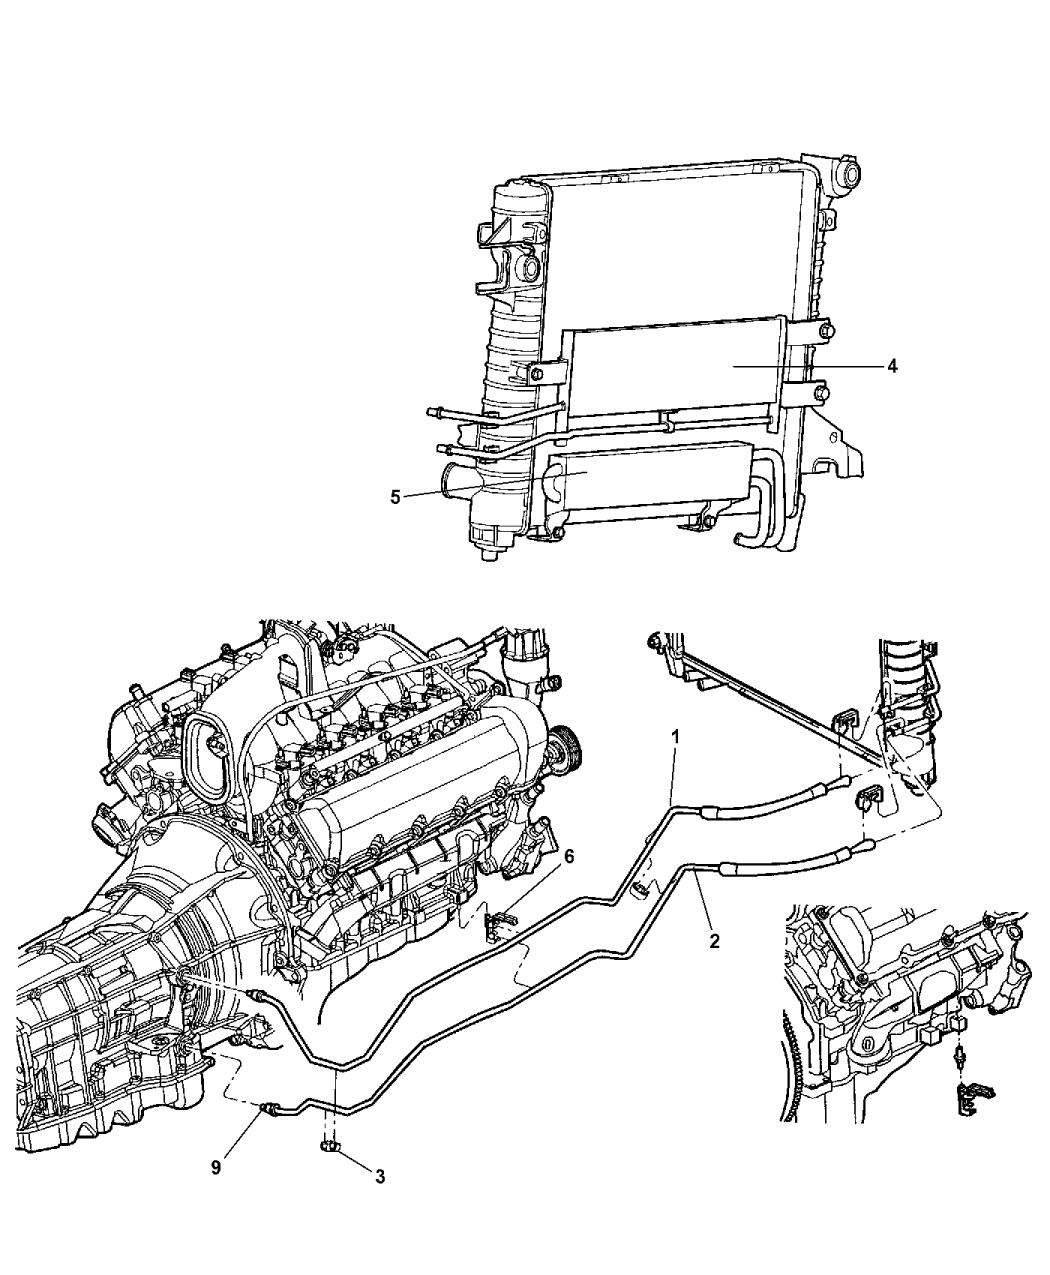 2006 Dodge Durango Transmission Oil Cooler & Lines - Thumbnail 1